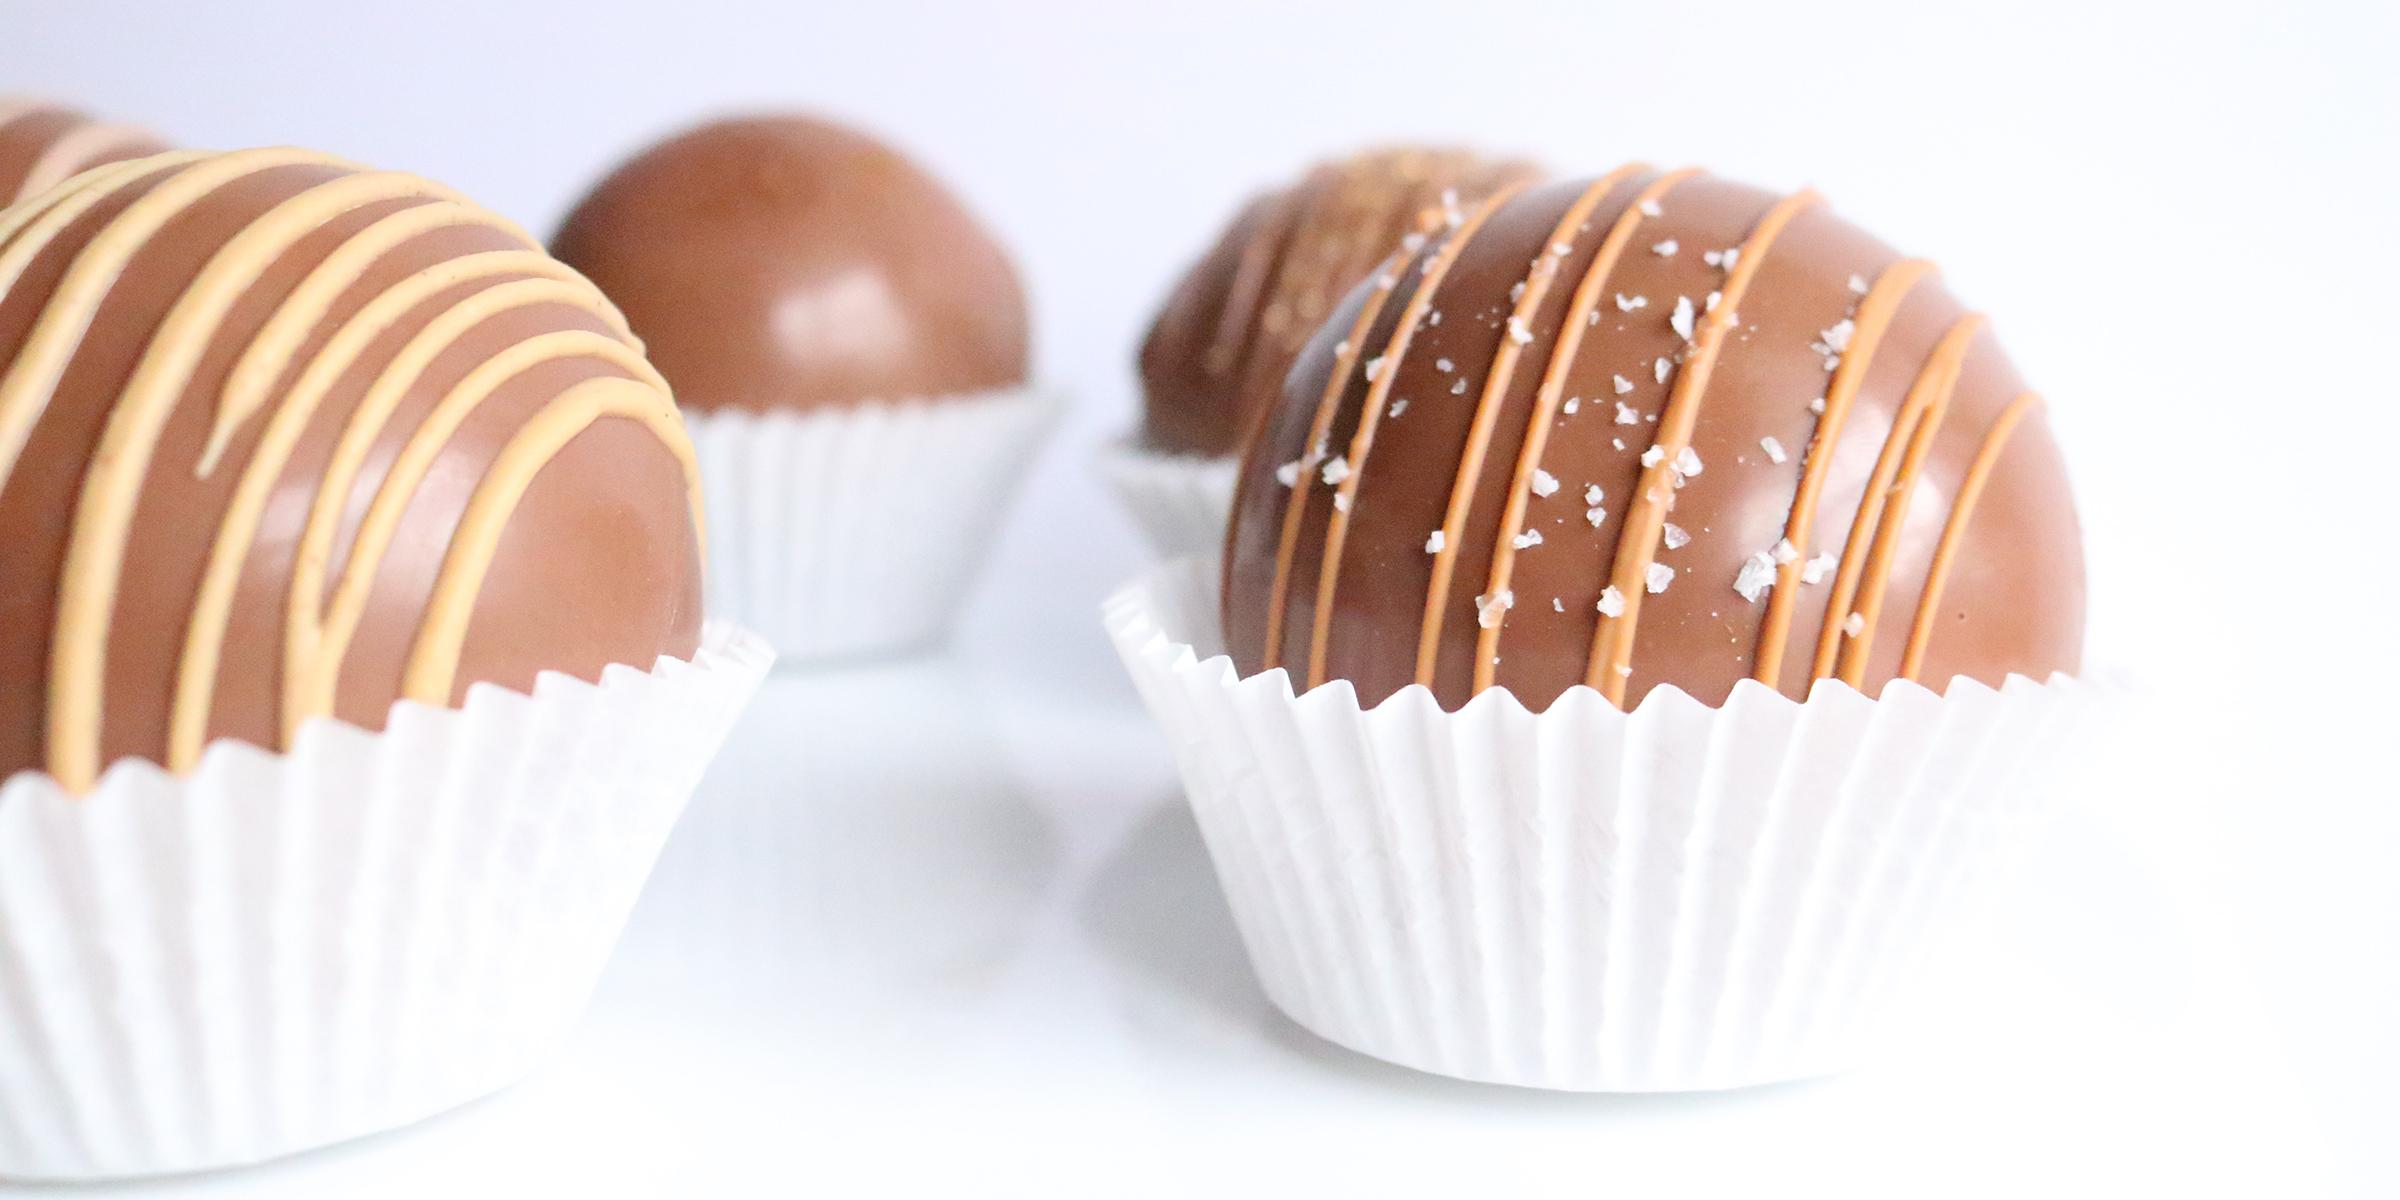 Chocolate cocoa bombs